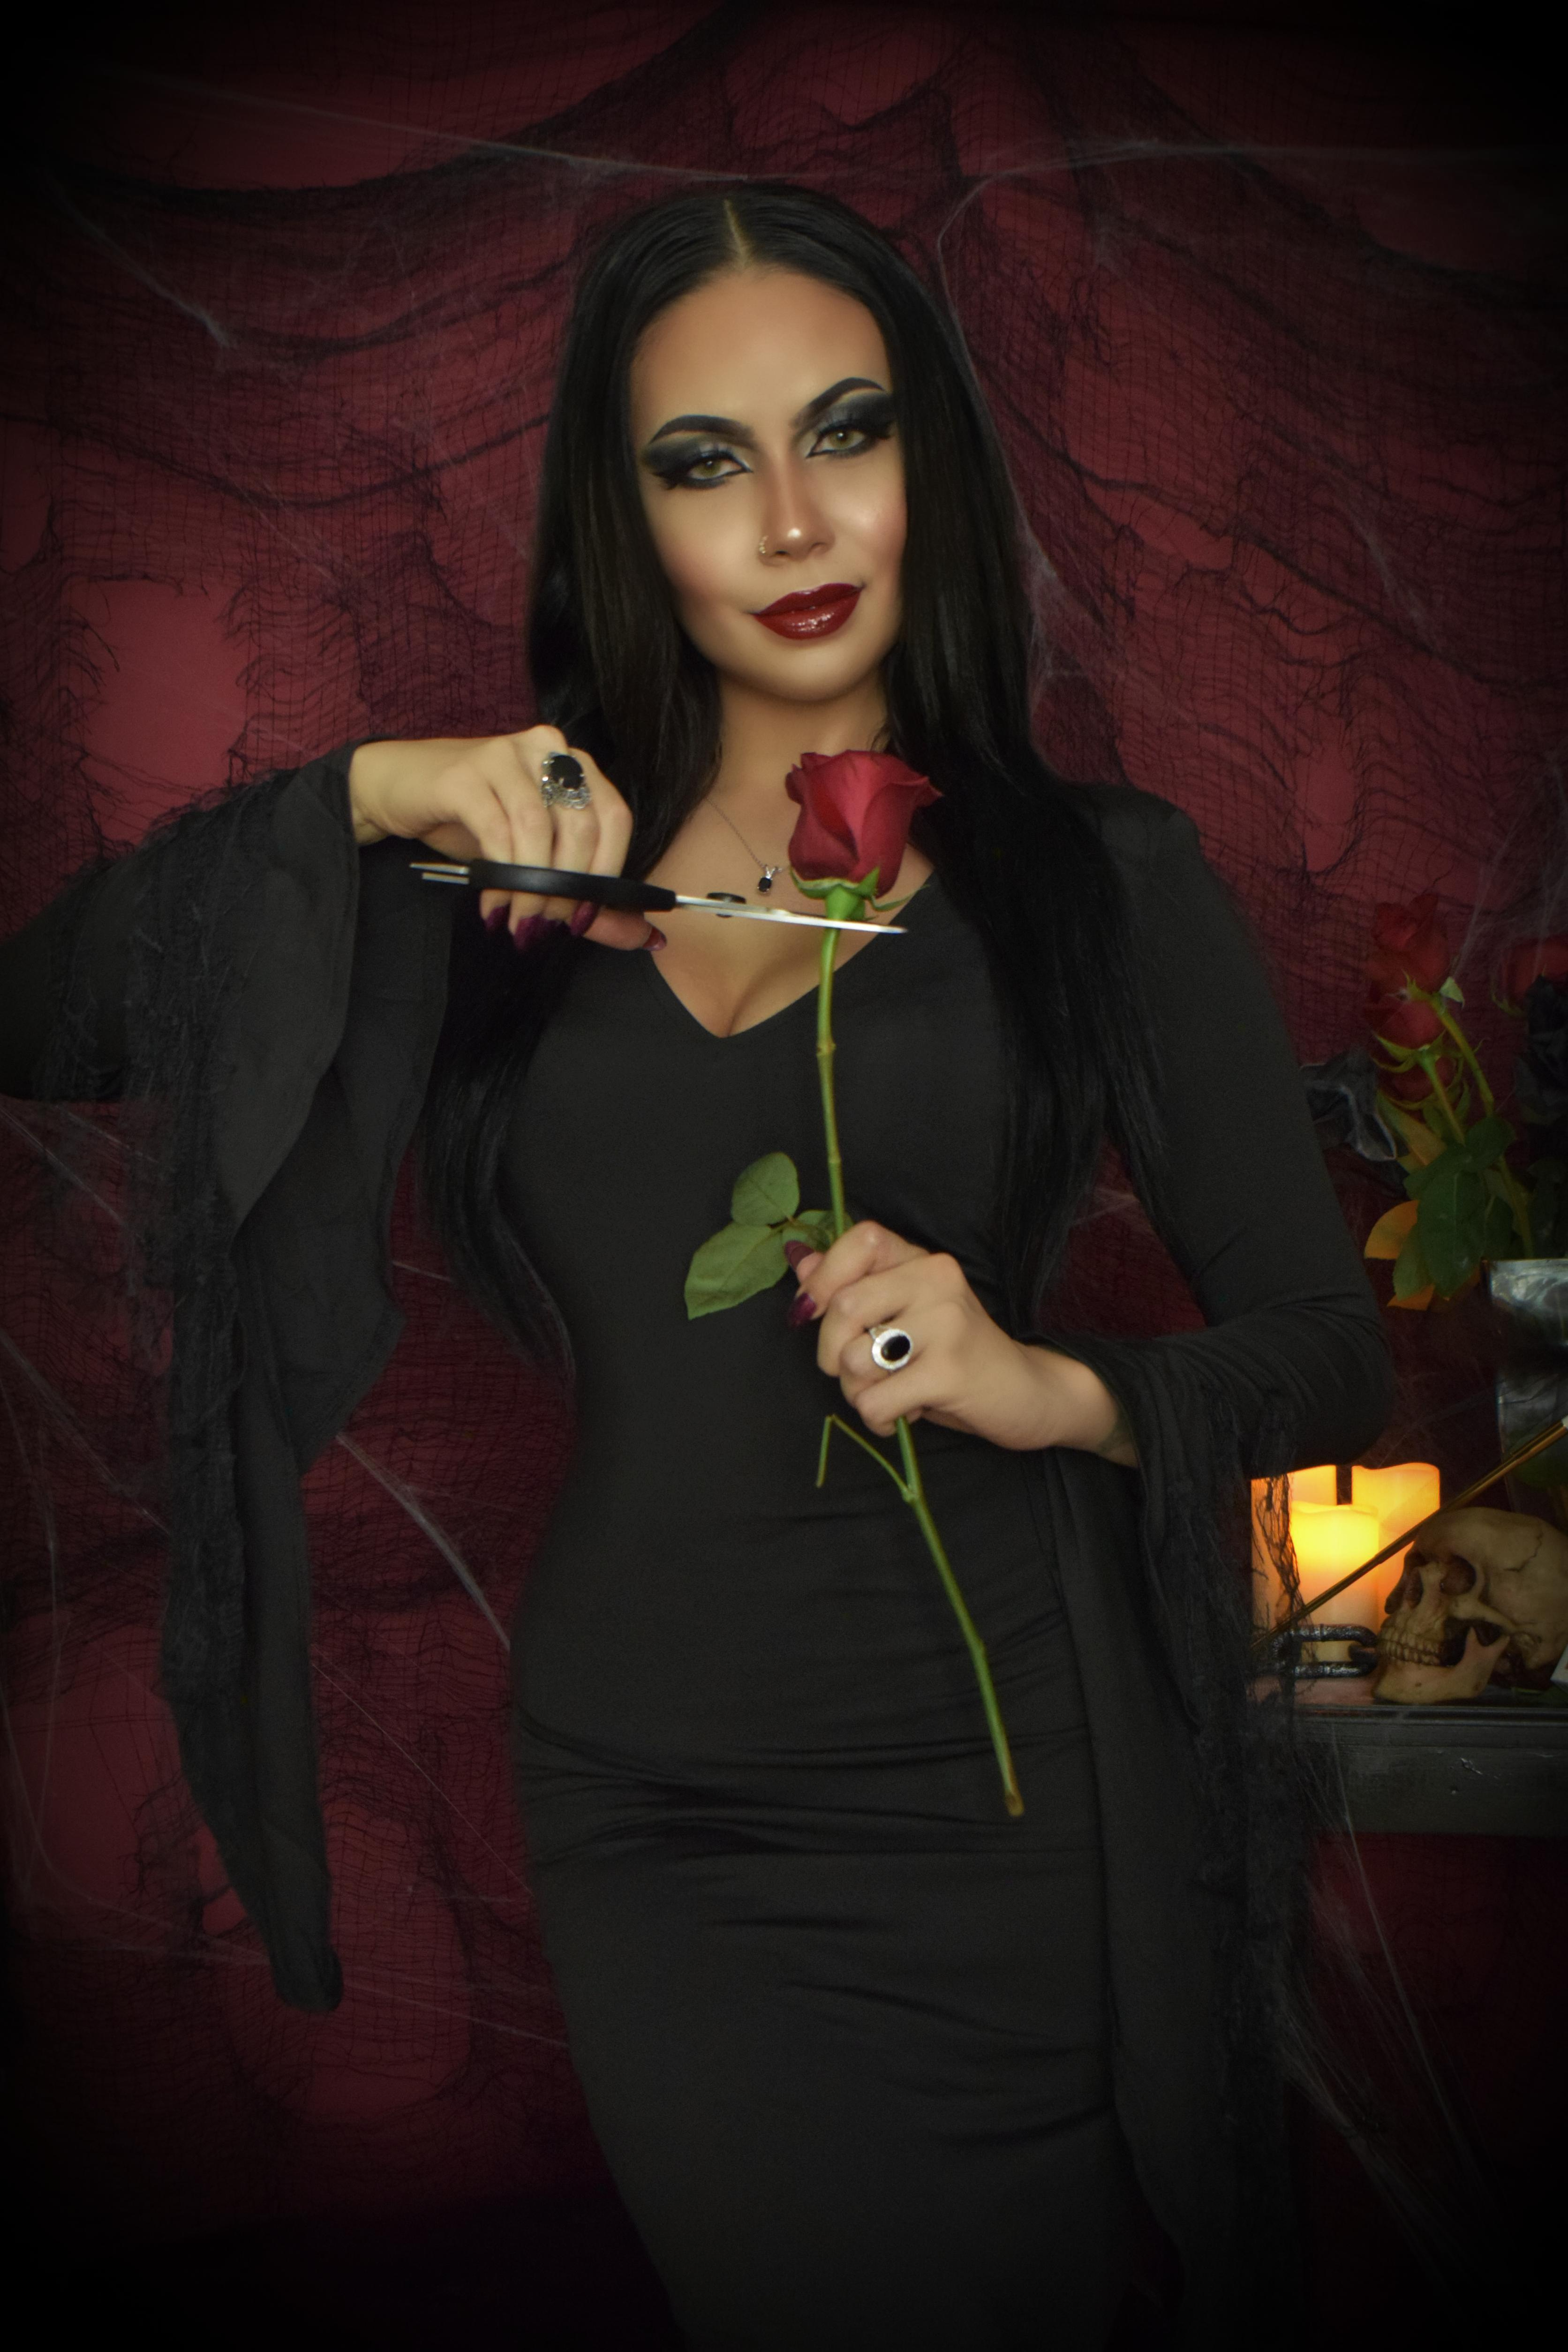 Morticia Addams Cosplay By Felicia Vox